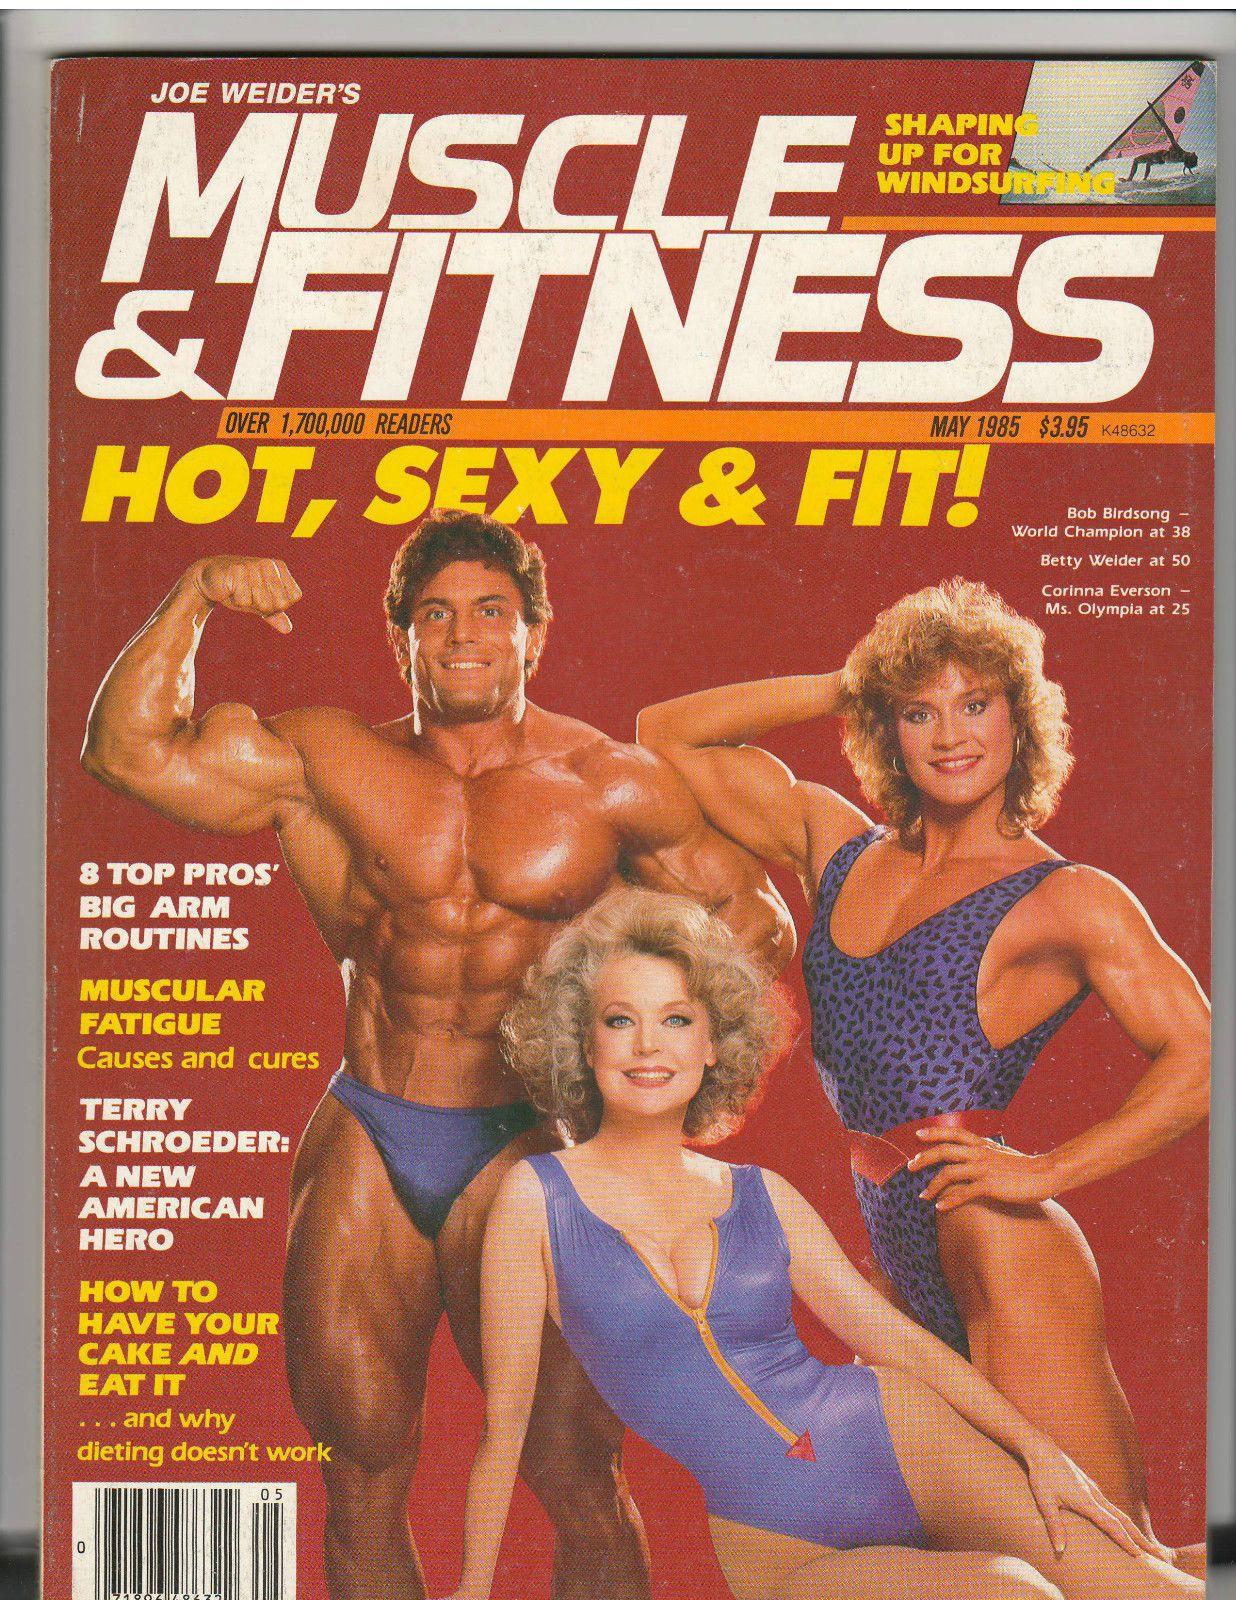 Muscle Fitness Bodybuilding Magazine Bob Birdsong Betty Weider Cory 5 85 Muscle Fitness Muscle Magazine Muscle